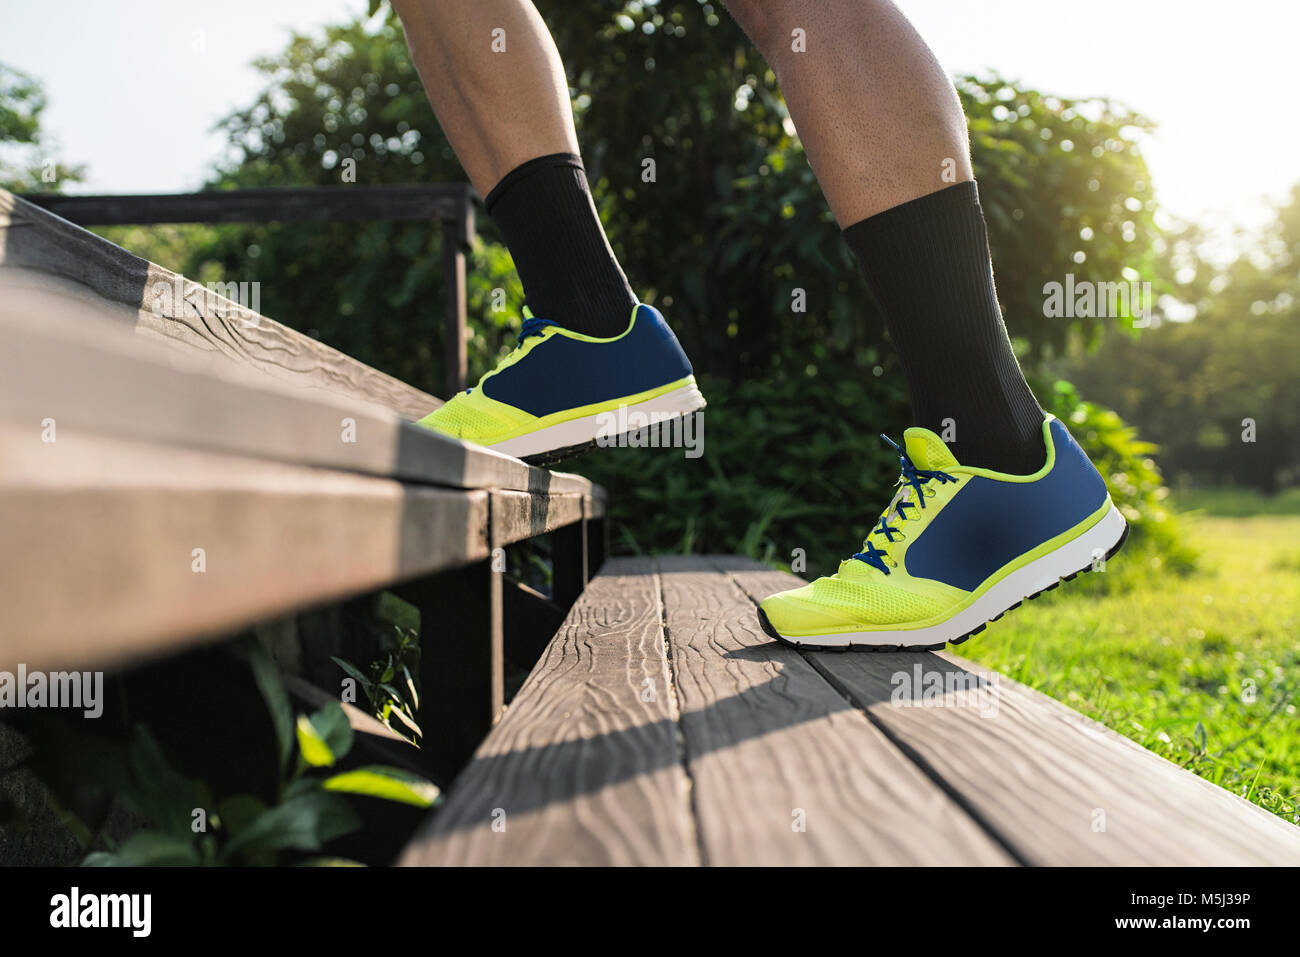 Runner entrenamiento running hasta las escaleras, cerrar Imagen De Stock